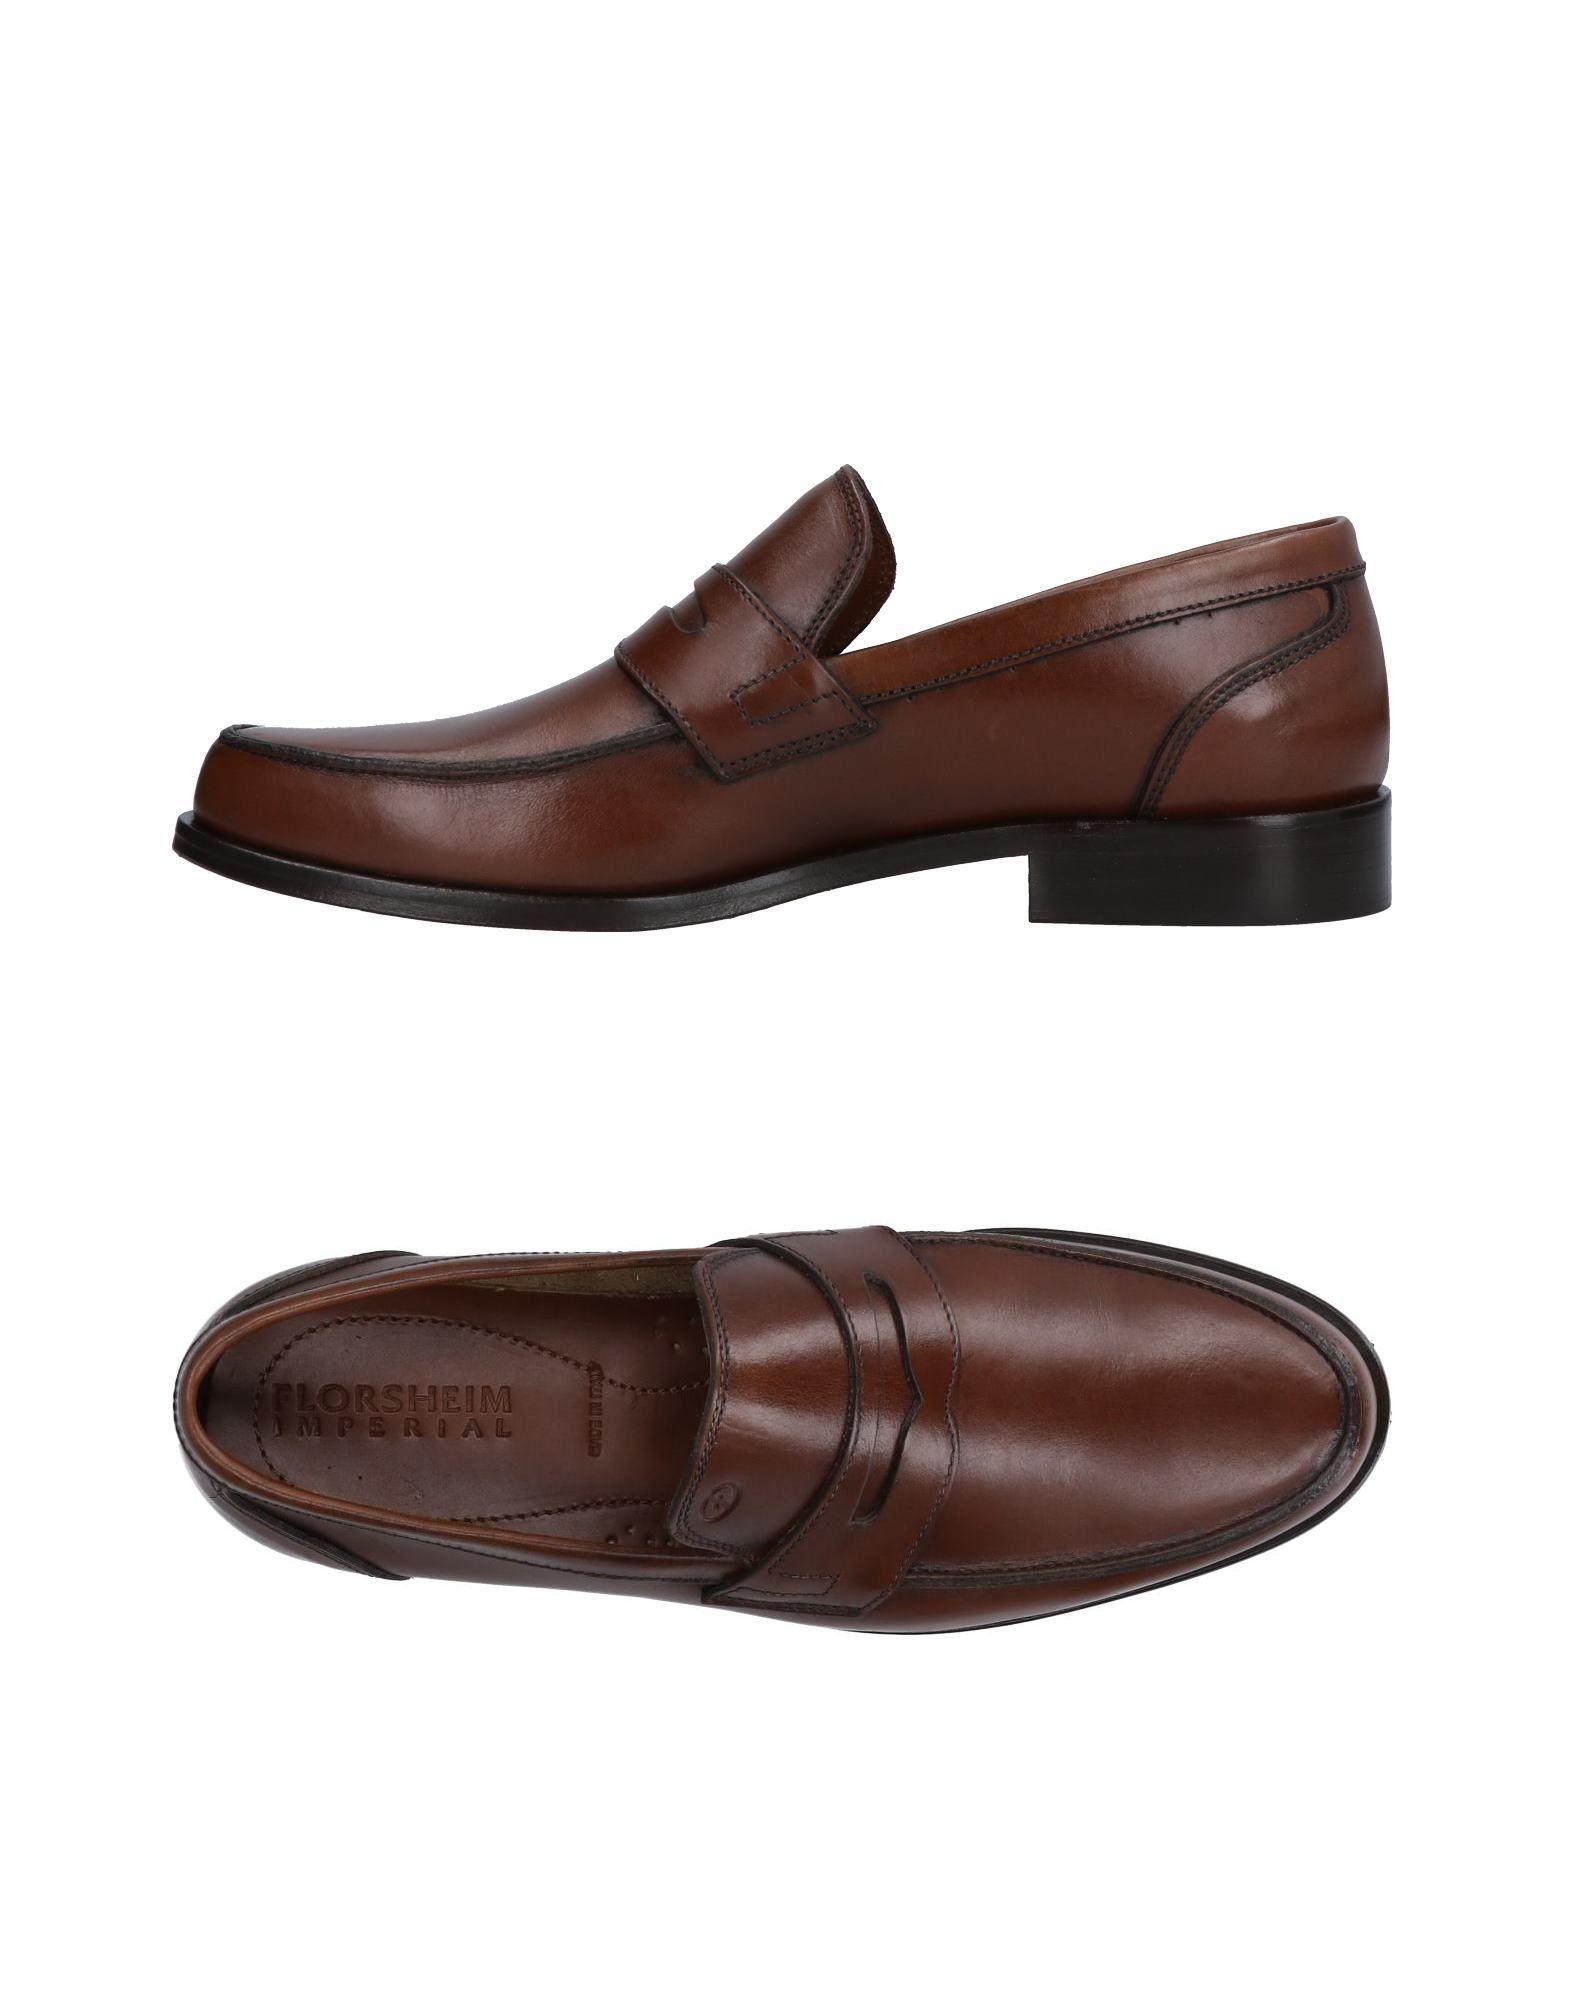 Florsheim Imperial Imperial Loafers - Men Florsheim Imperial Imperial Loafers online on  Canada - 11506164IC 8d8831